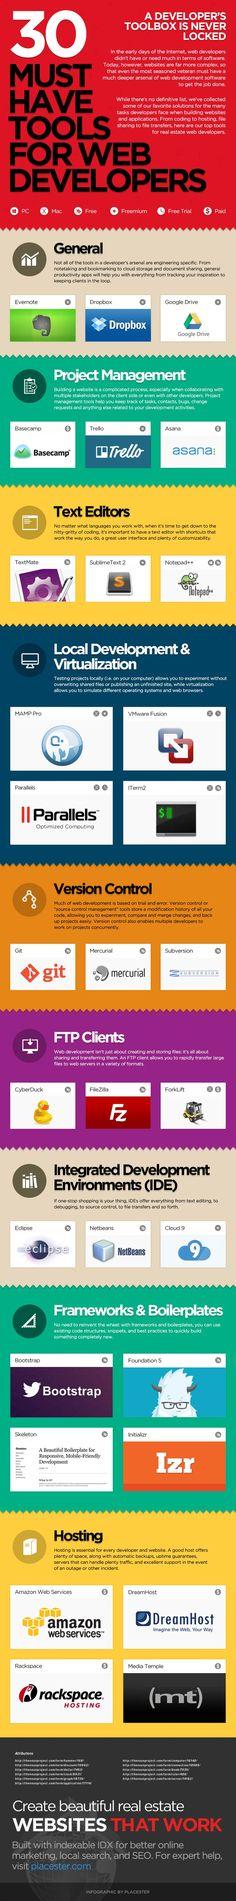 30 Must Have Tools for Web Developers Latest News & Trends on #webdesign and #webdevelopment | http://webworksagency.com: